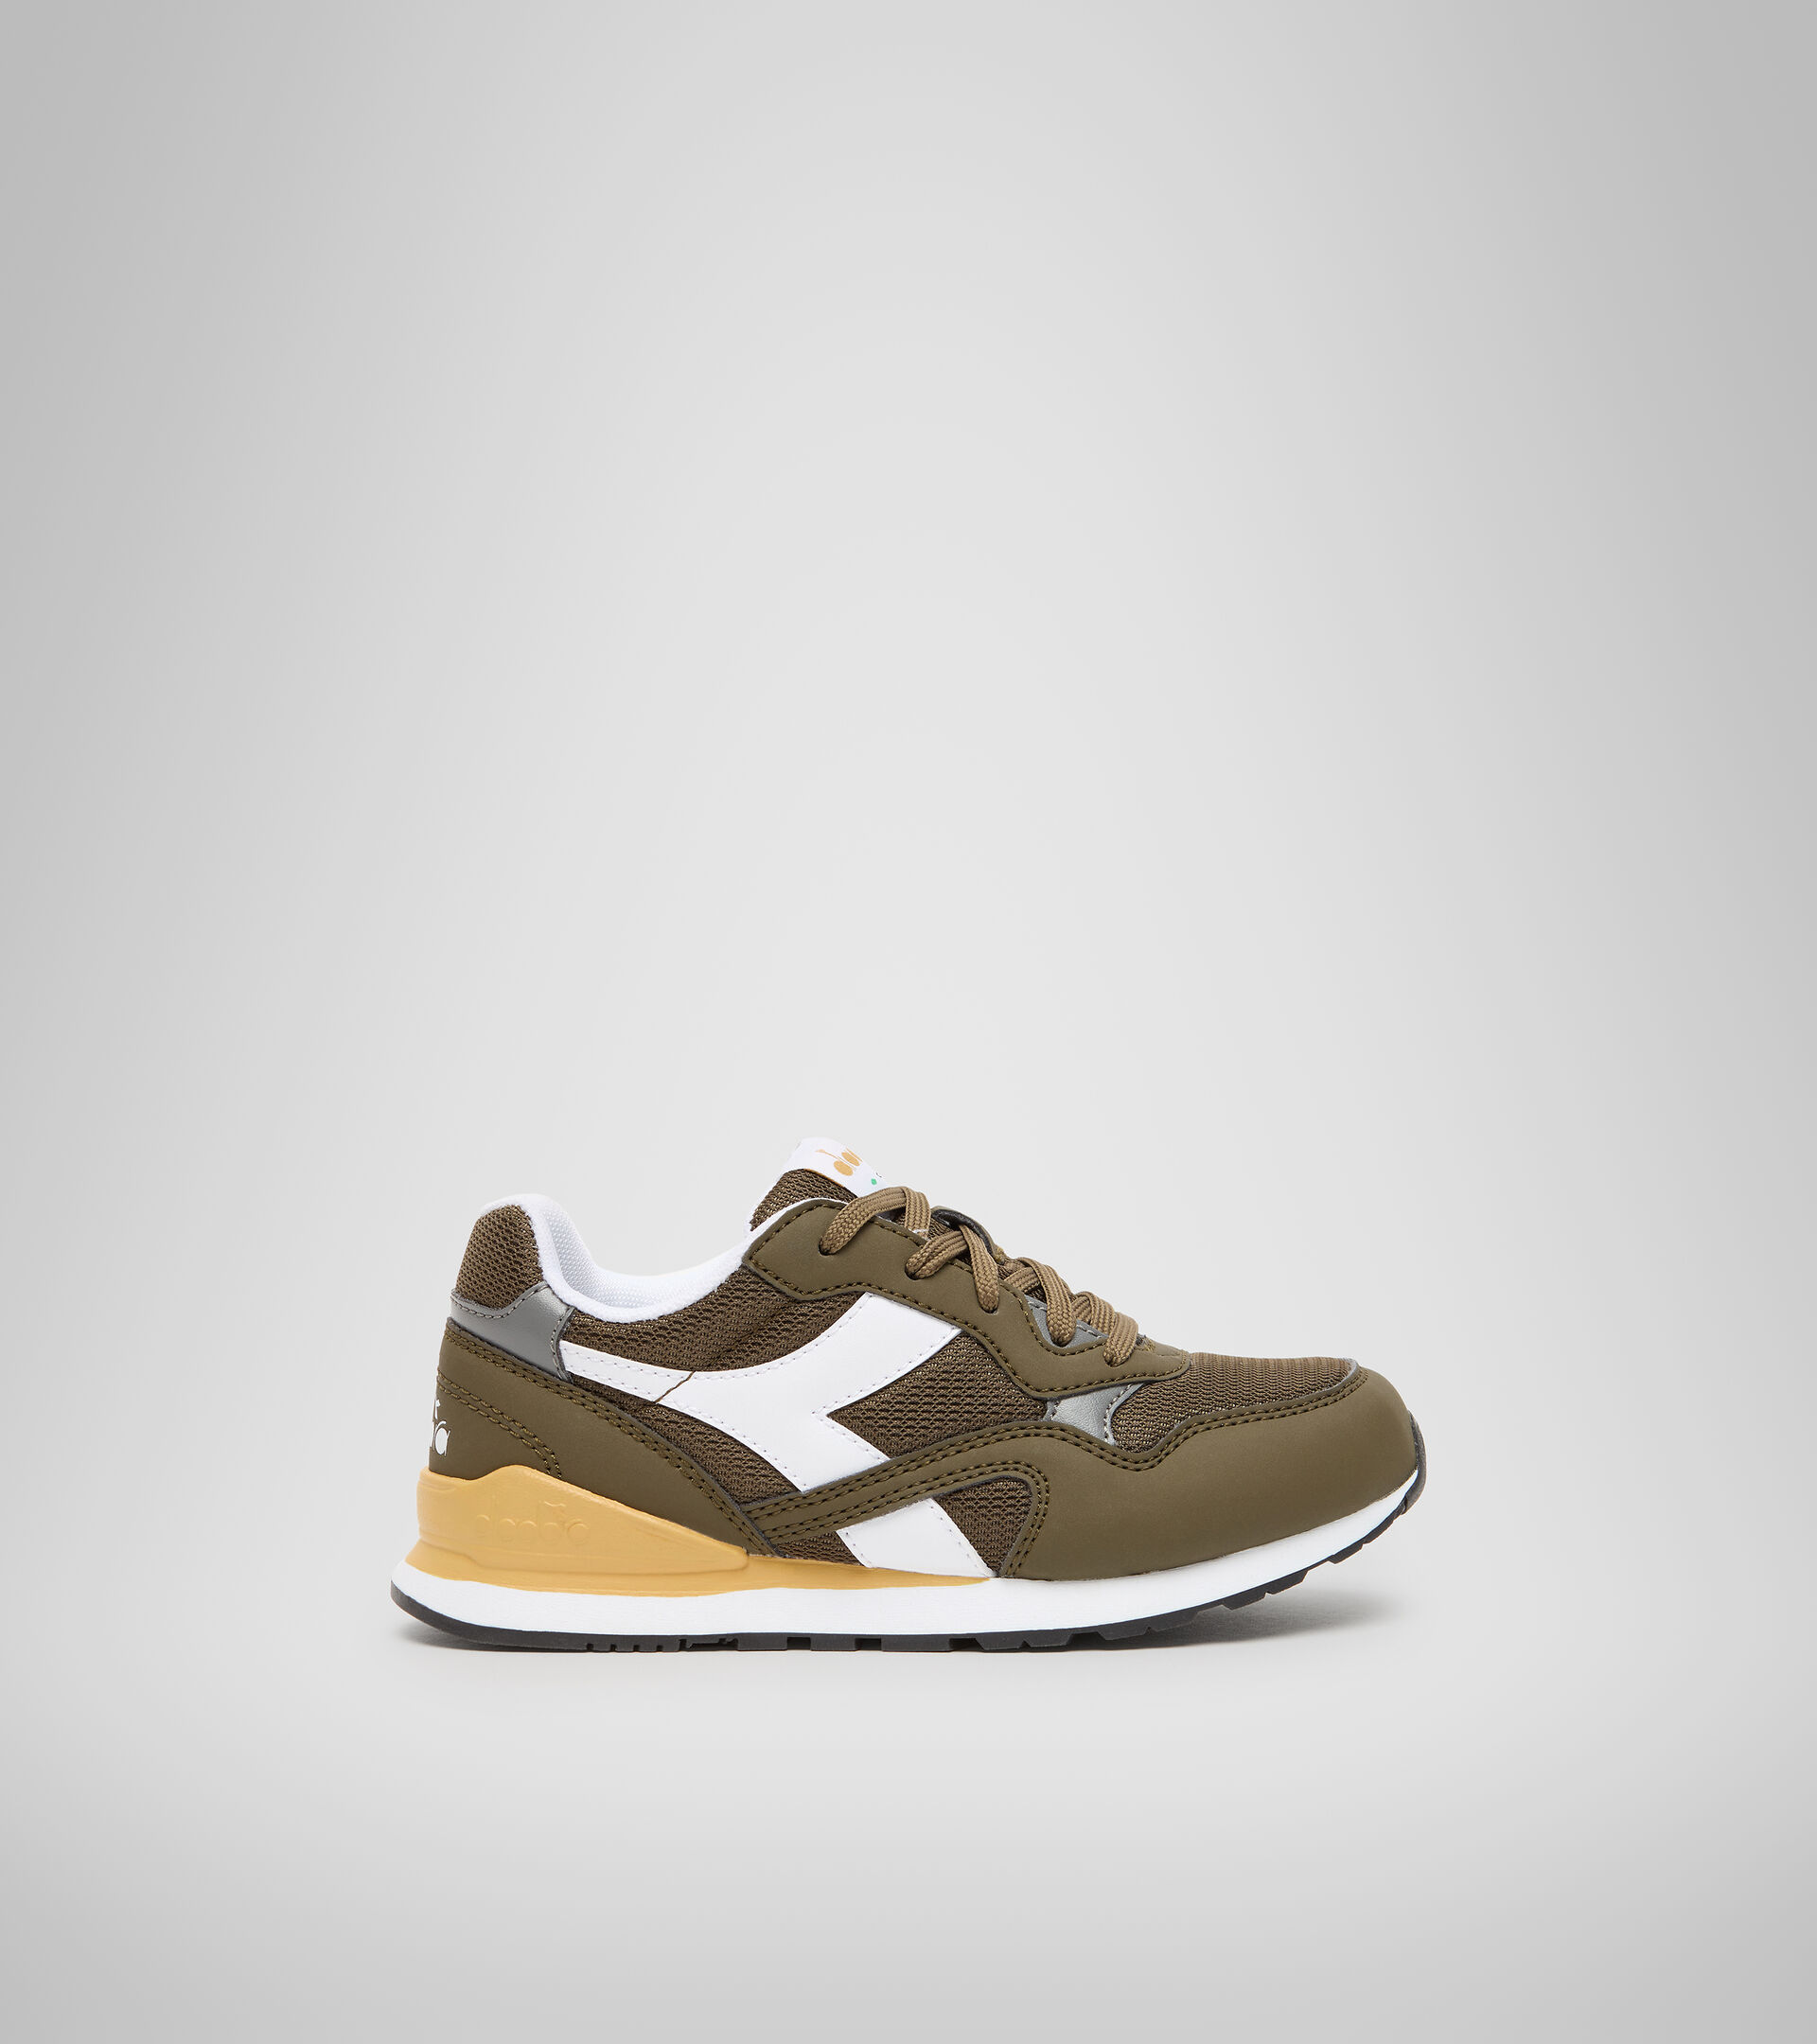 Footwear Sport BAMBINO N.92 PS OLIVE GREEN Diadora